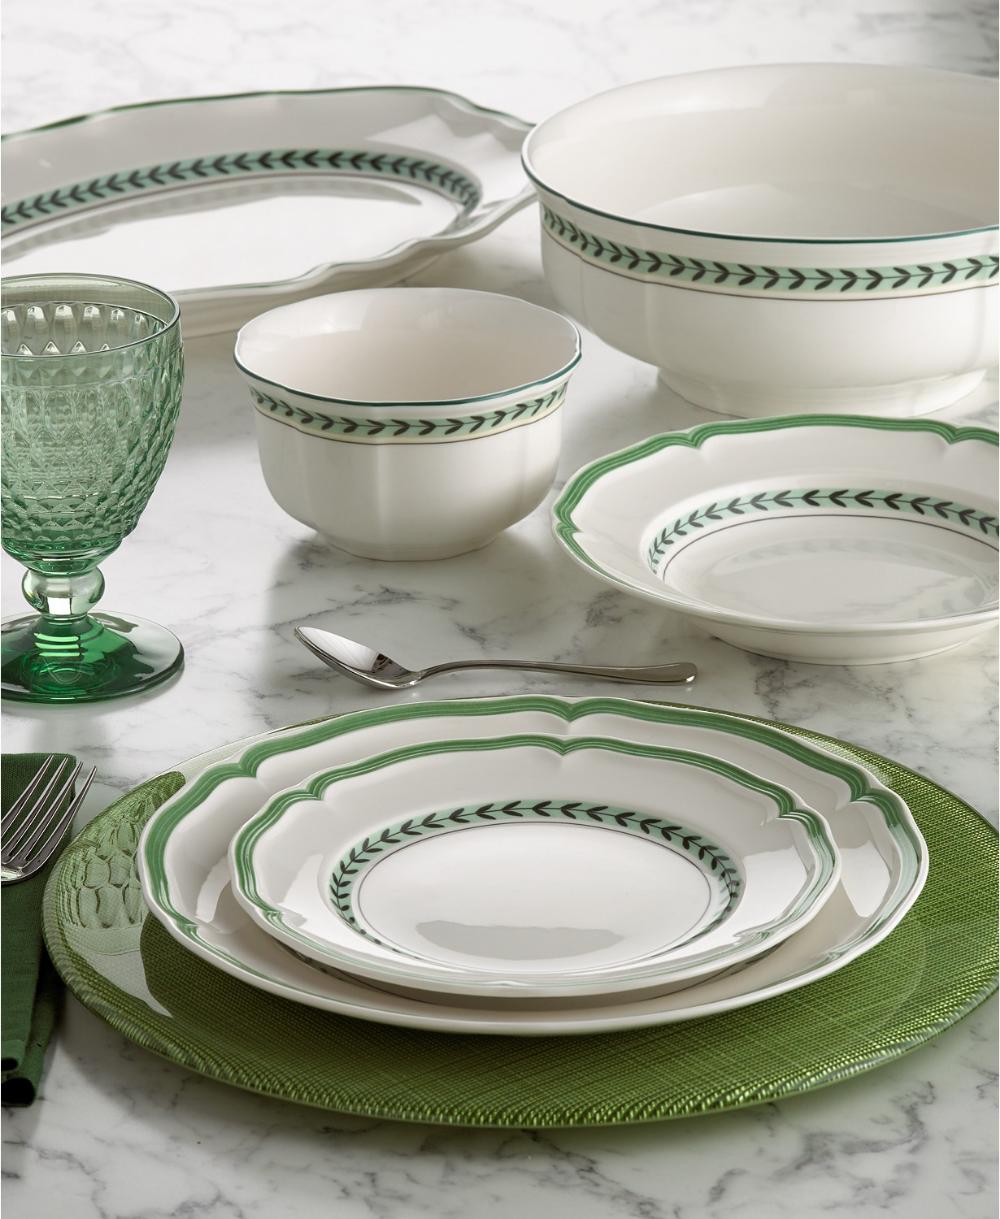 Villeroy Boch French Garden Green Line Dinnerware Collection Reviews Dinnerware Dining Macy S In 2020 Dinnerware Tableware Dinnerware Green Dinnerware